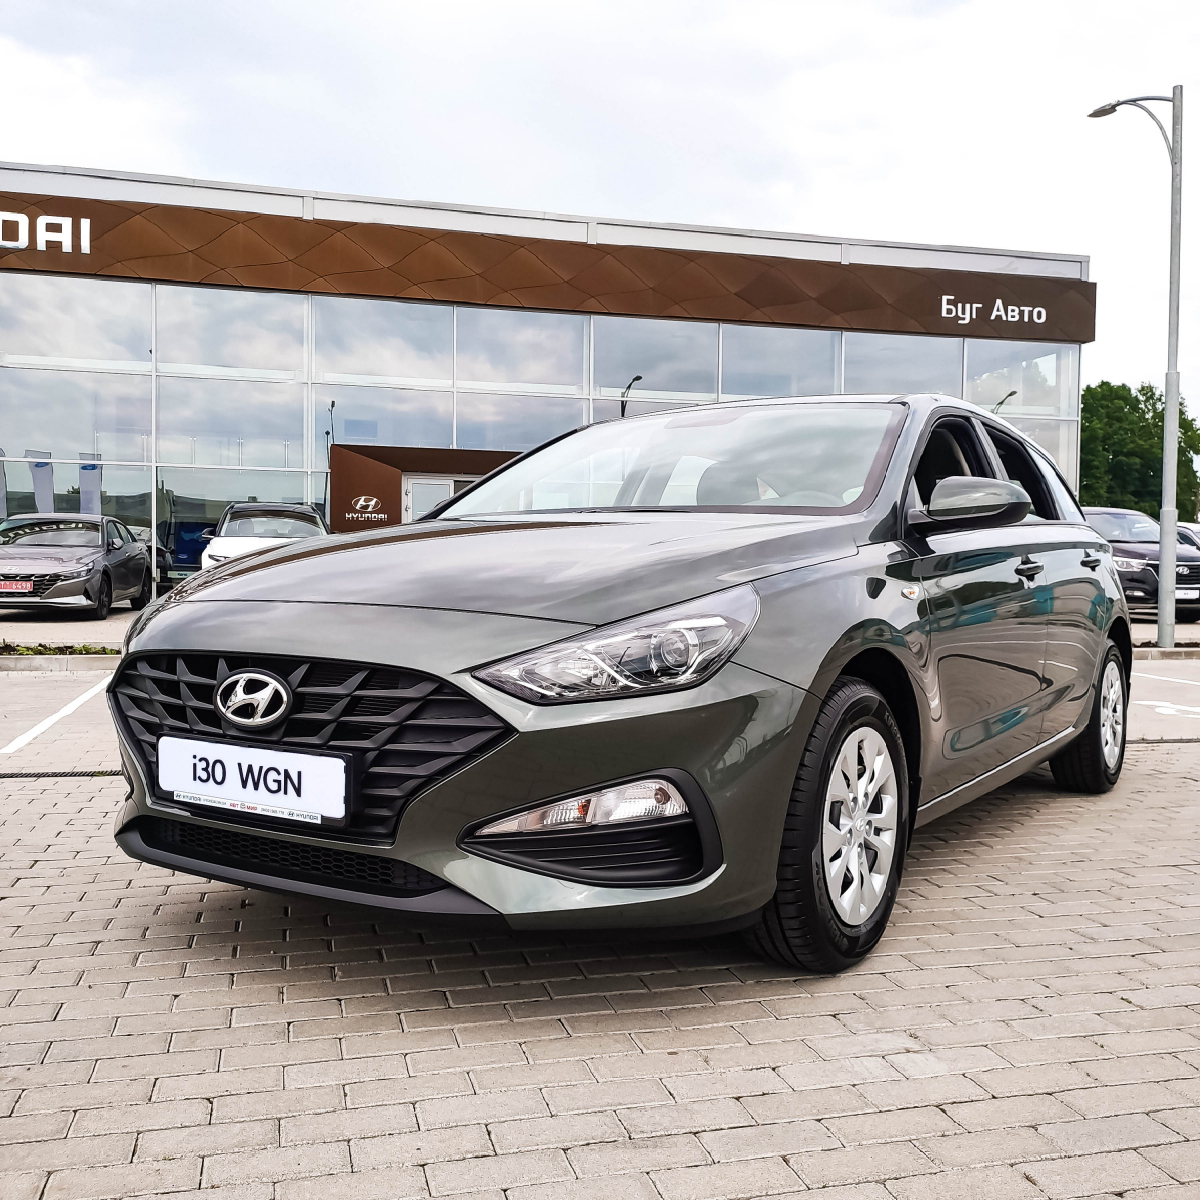 Спеціальна вигода на придбання Hyundai i30 WGN!   Хюндай Мотор Україна - фото 9